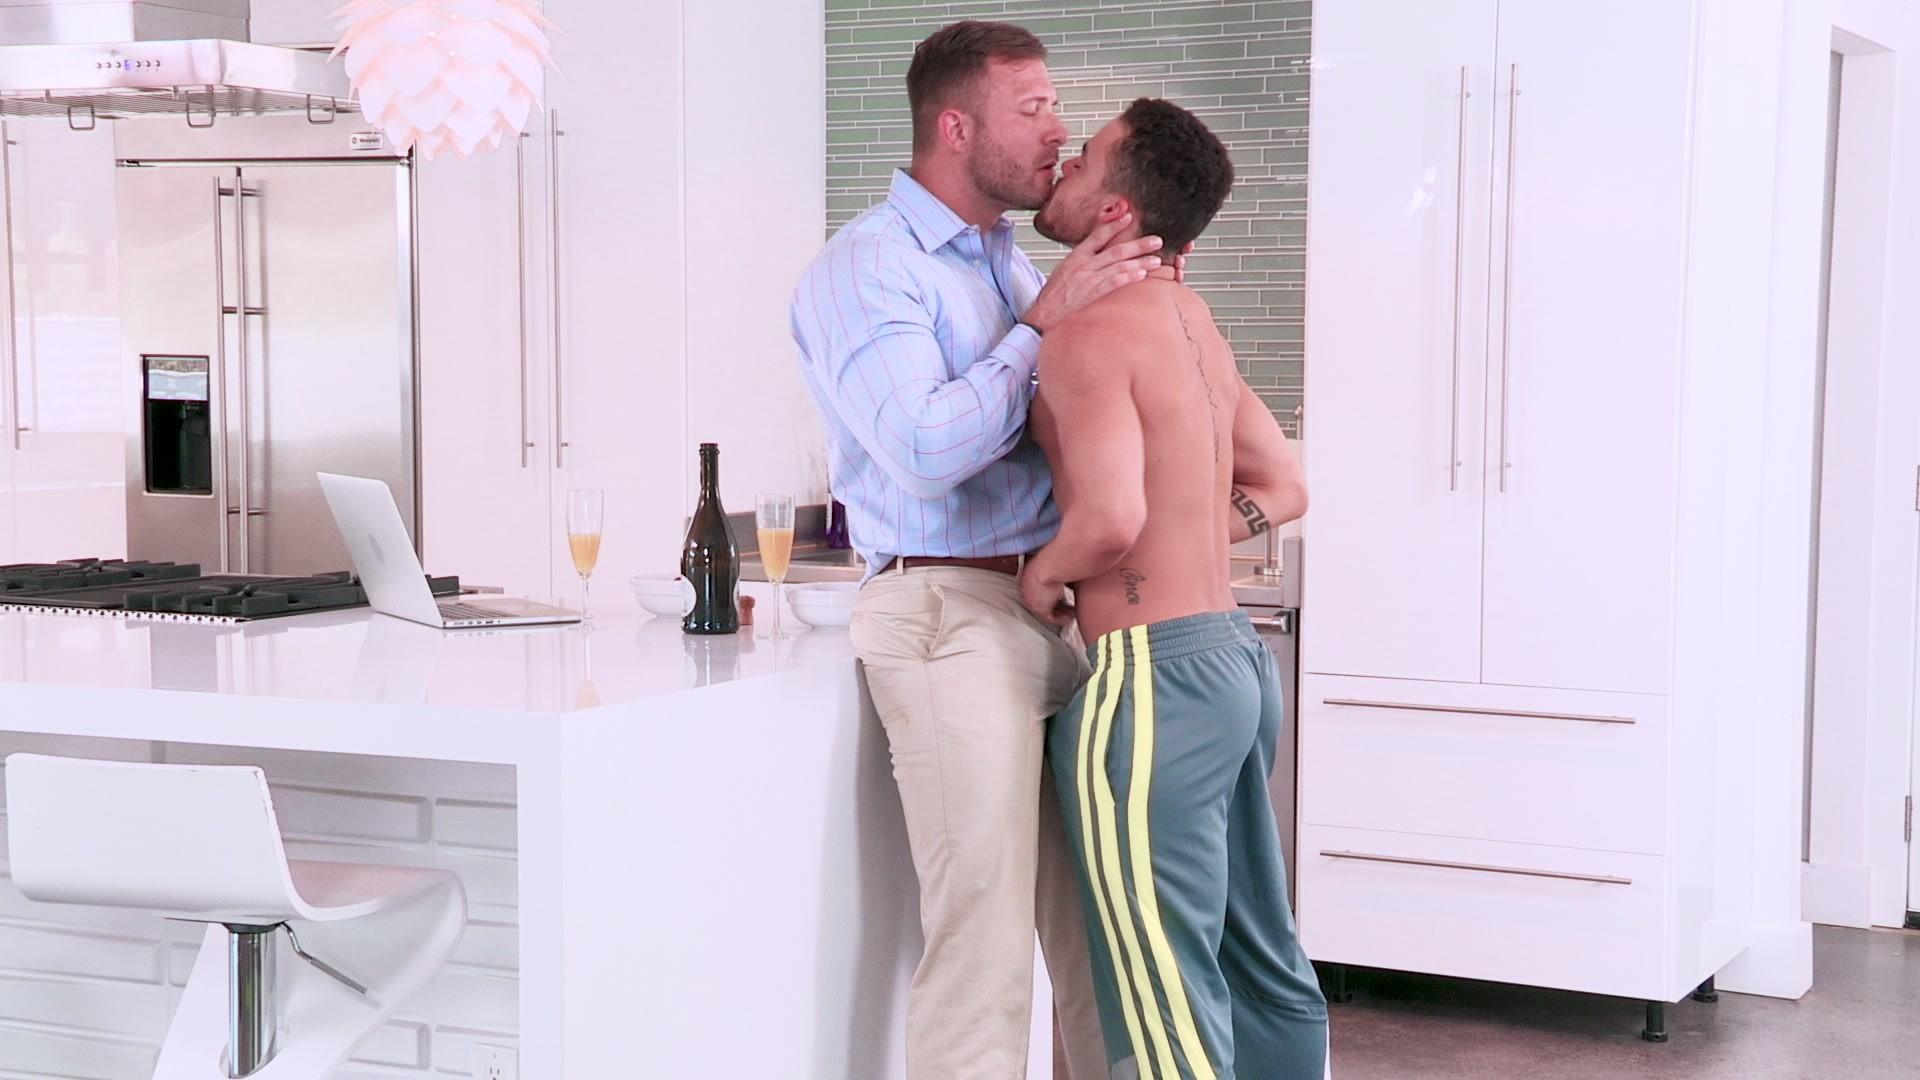 Leje Fixer, The Hot House Video Porno Movie Rental Gay-6118